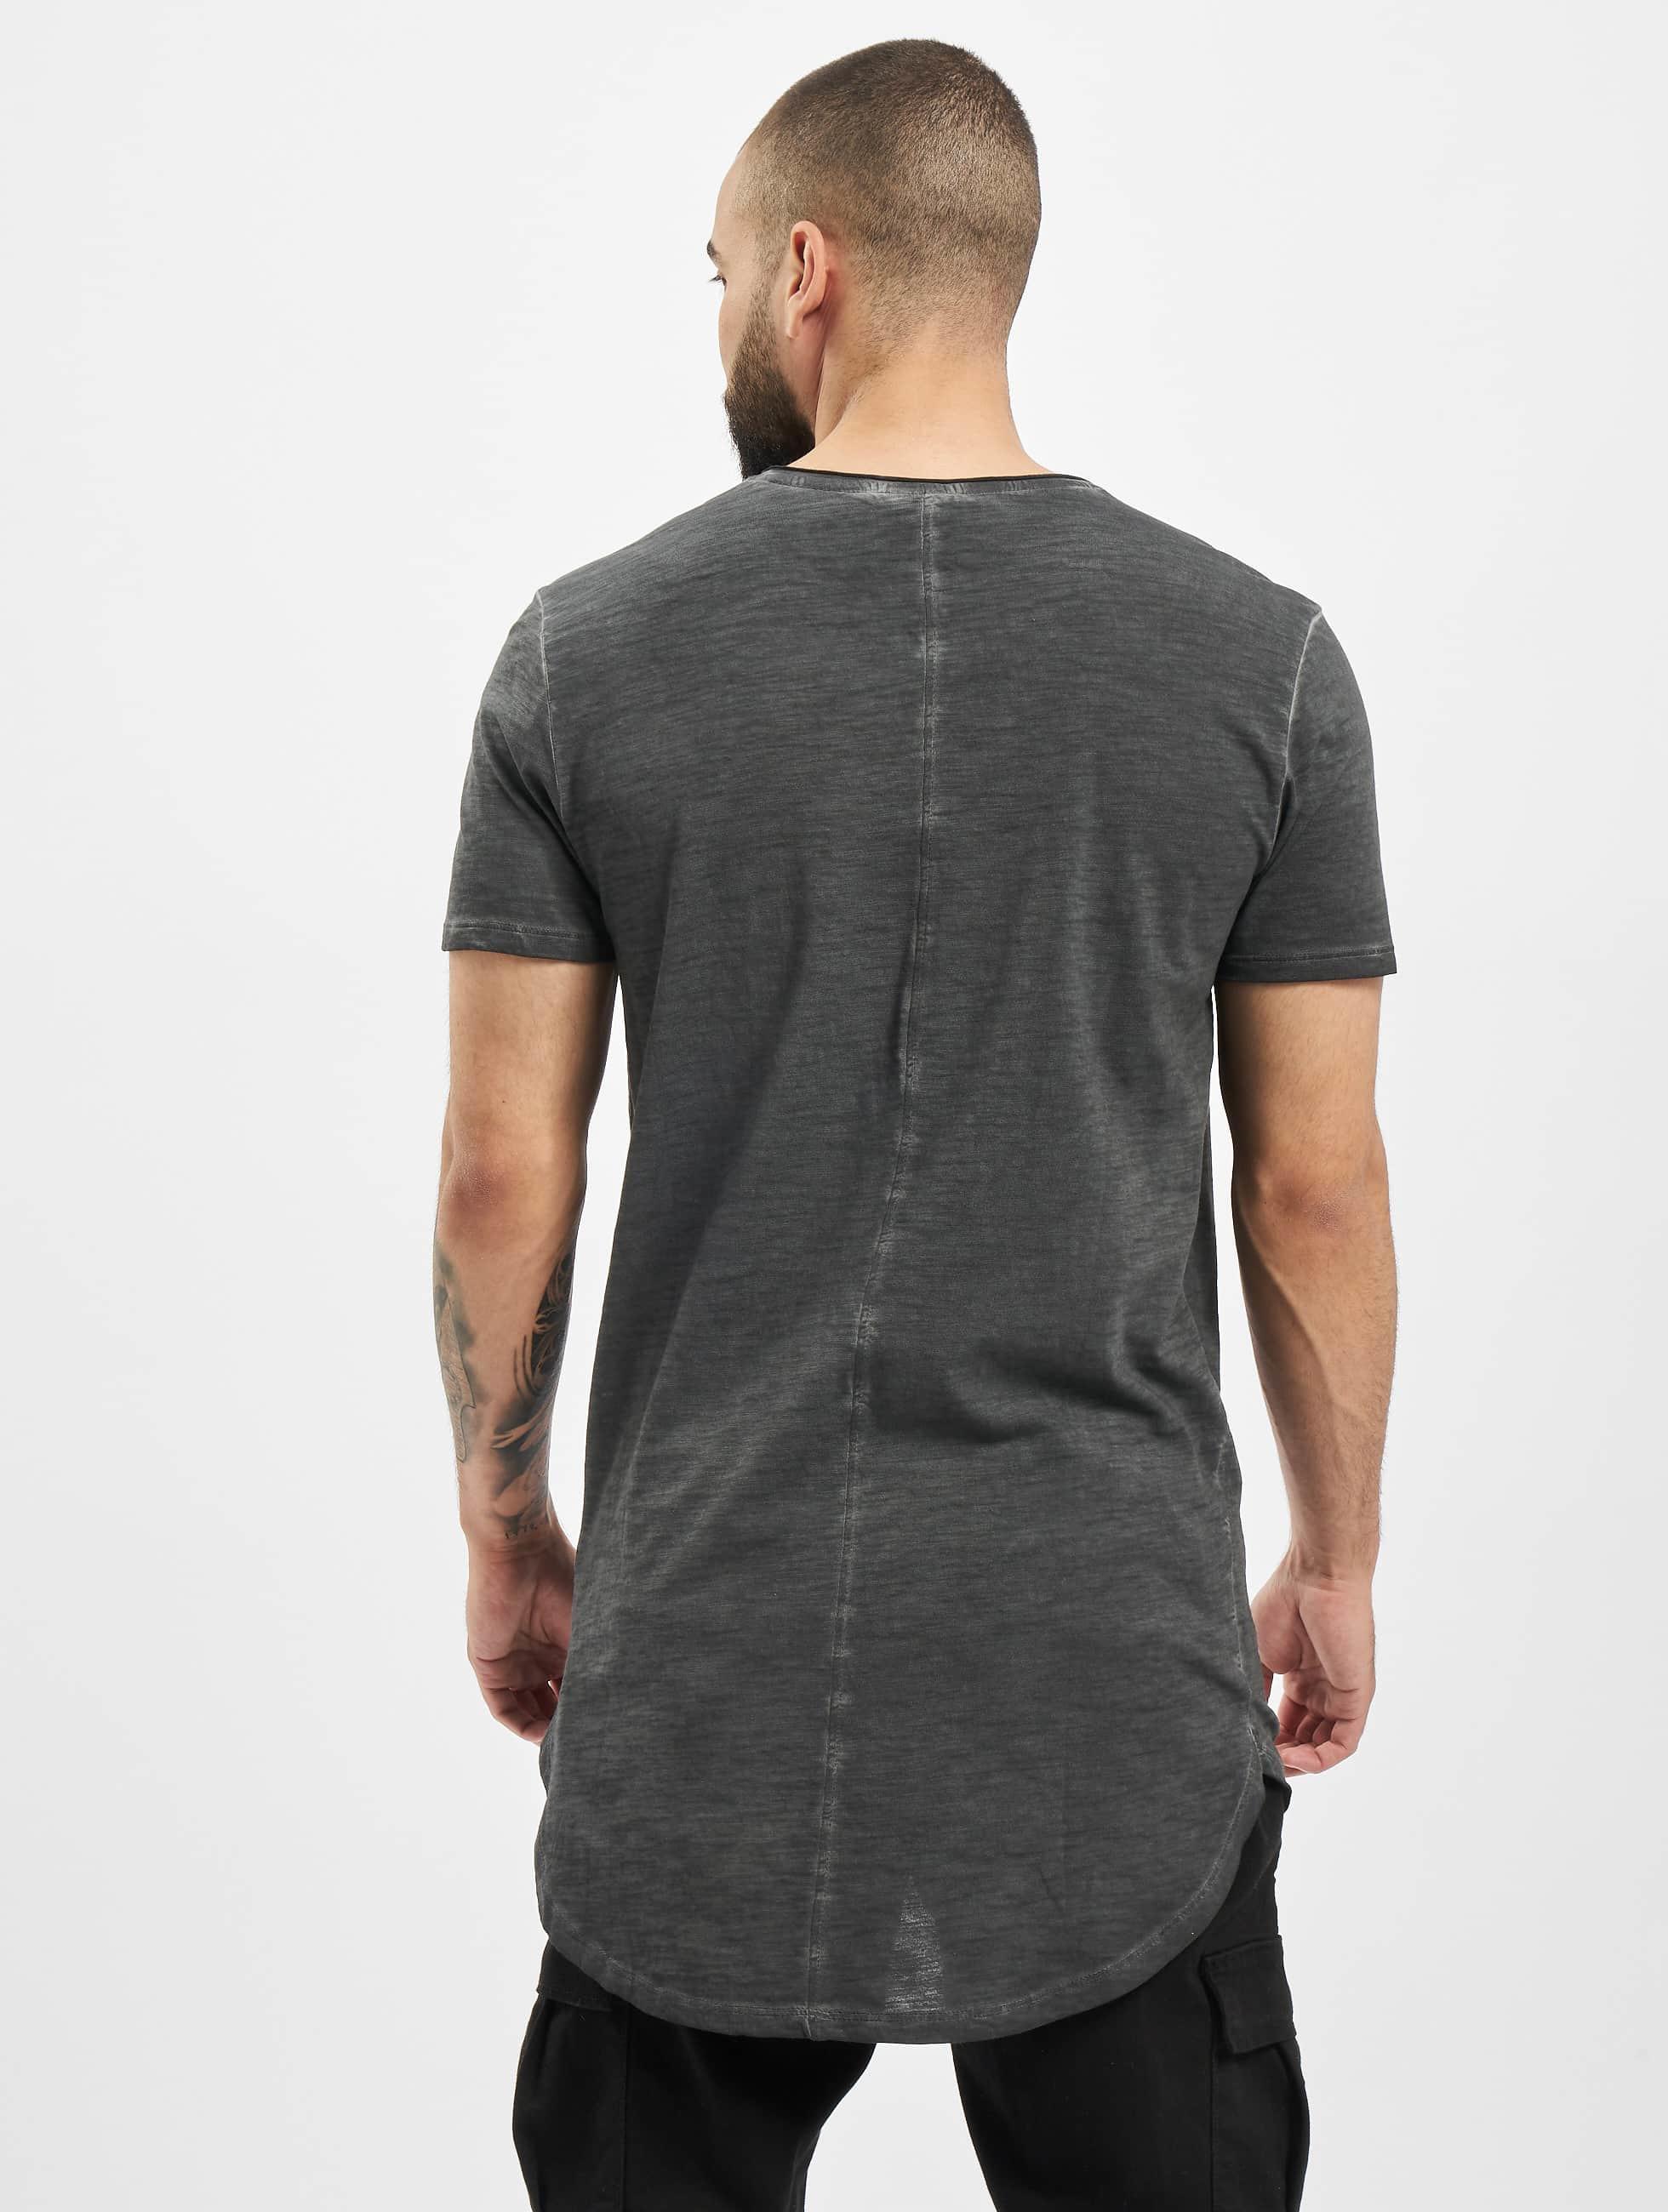 Urban Classics Tall Tees Long Back Shaped Spray Dye grijs